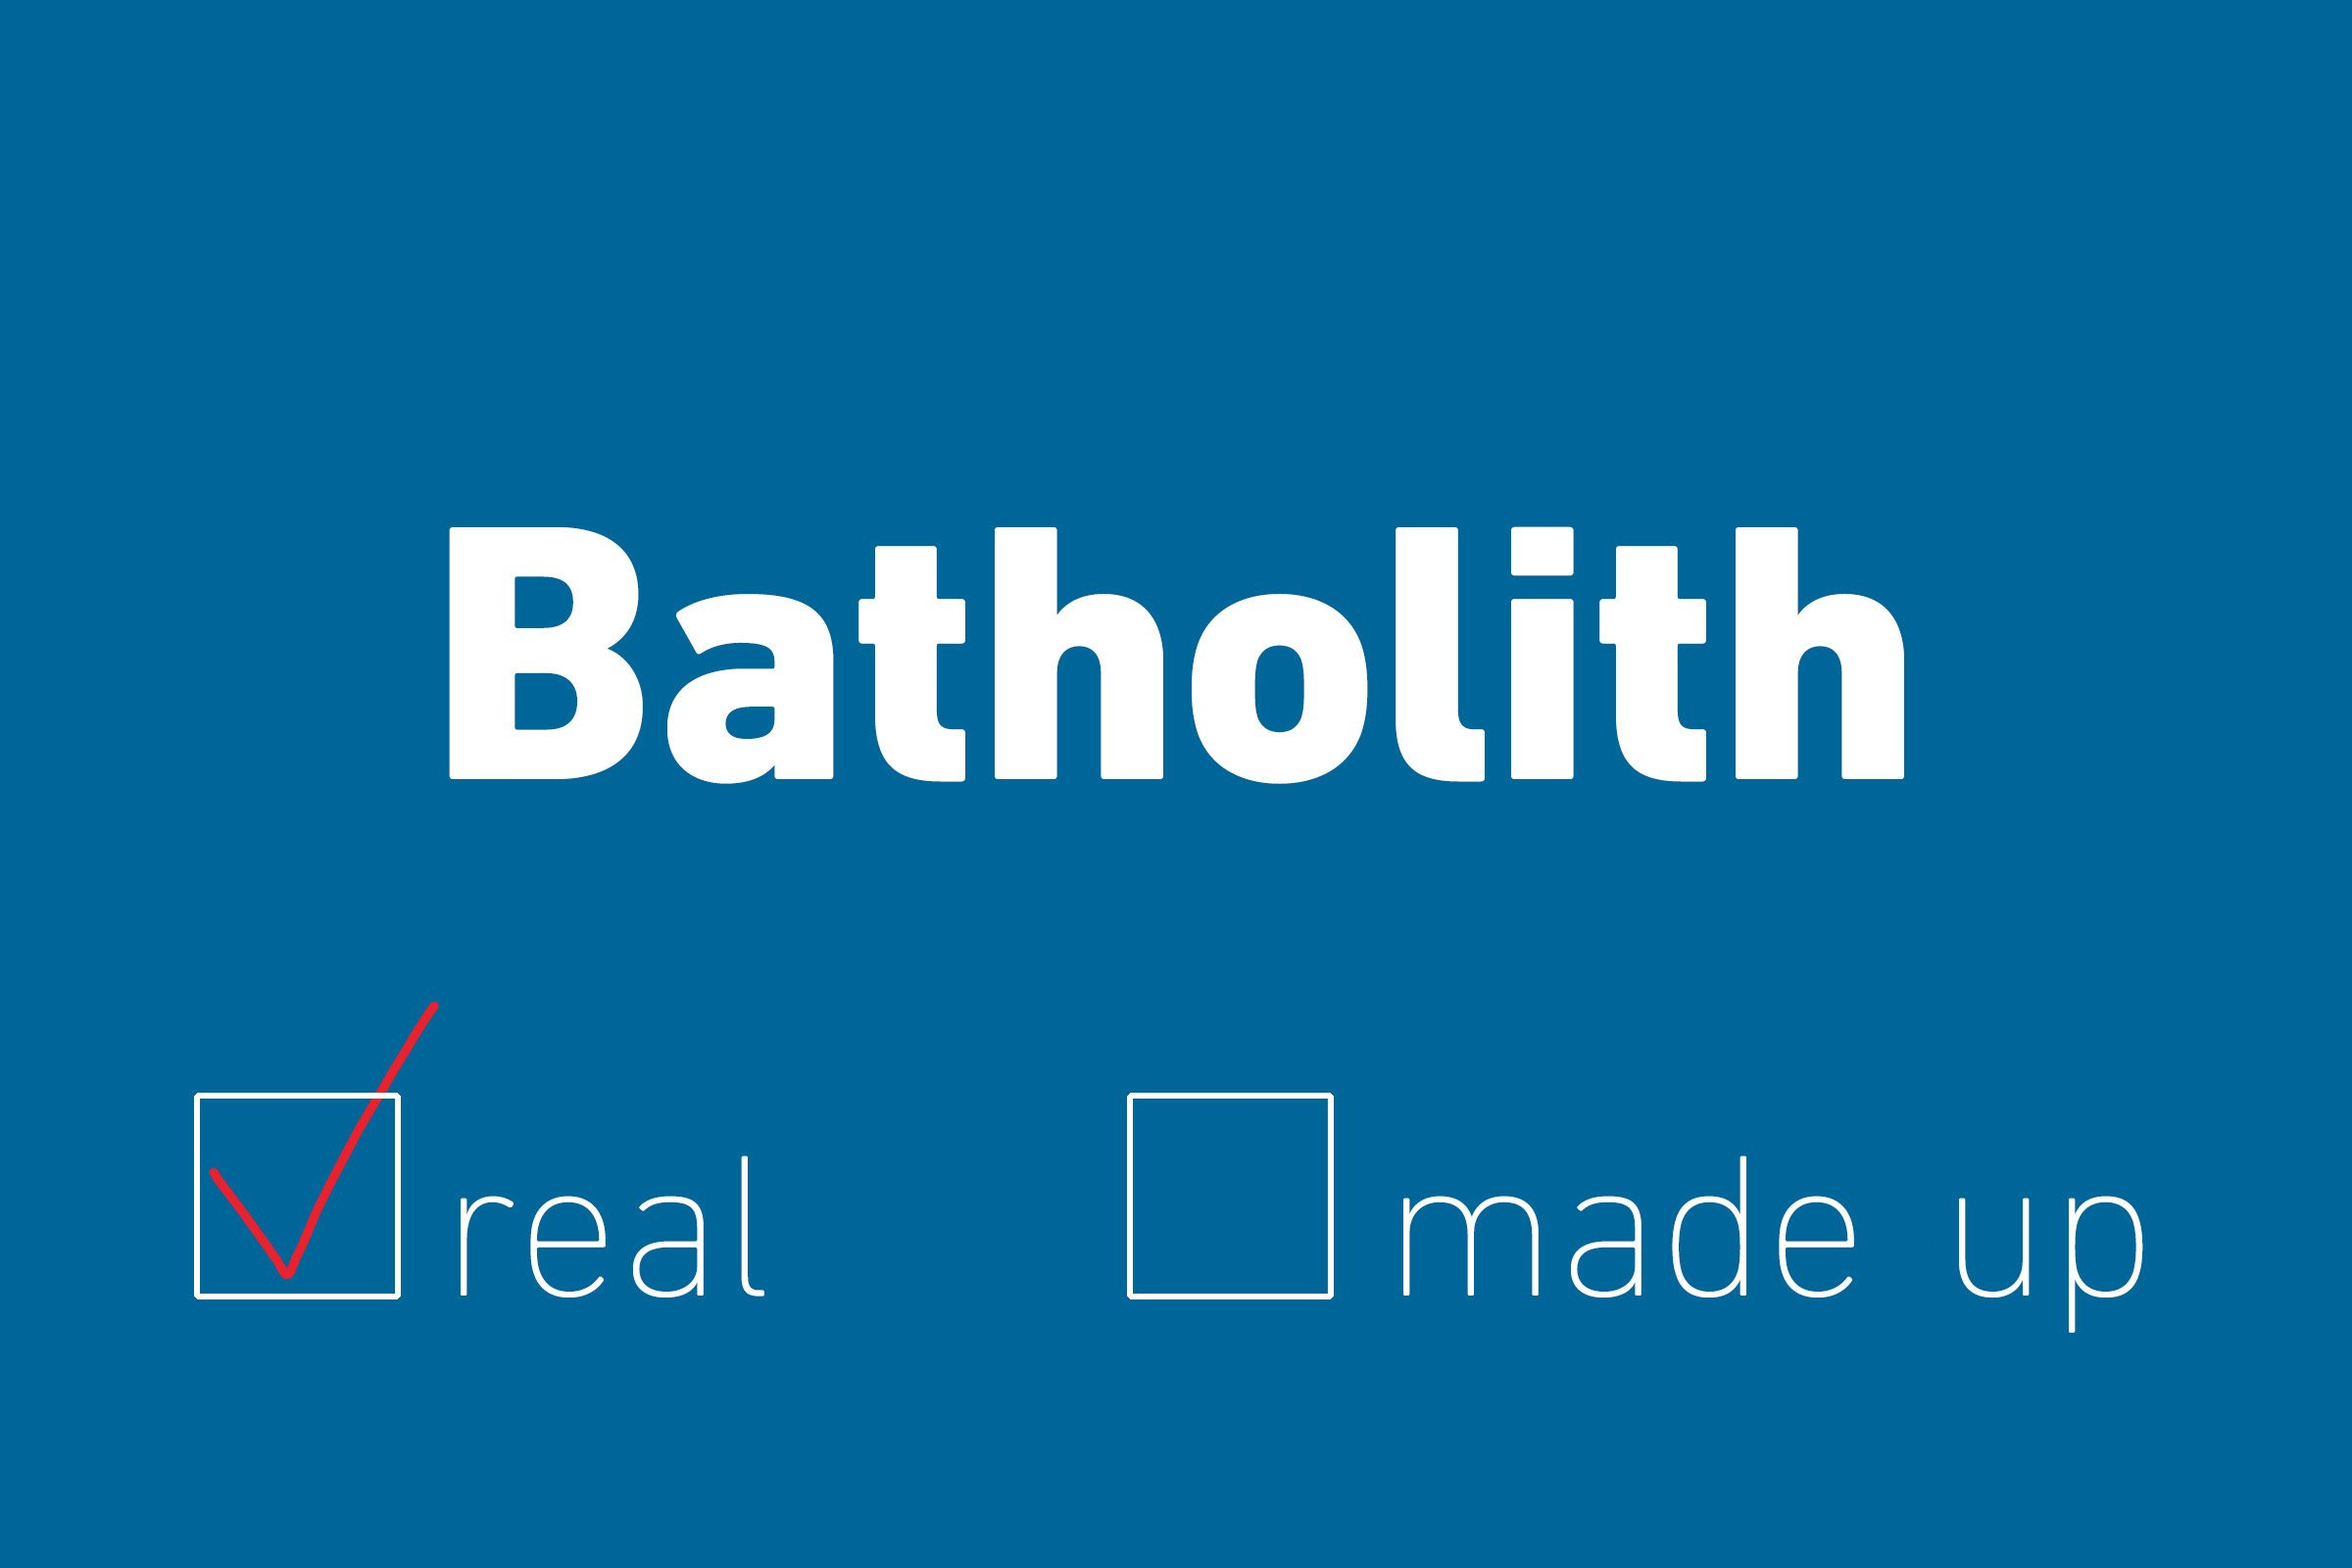 batholith real